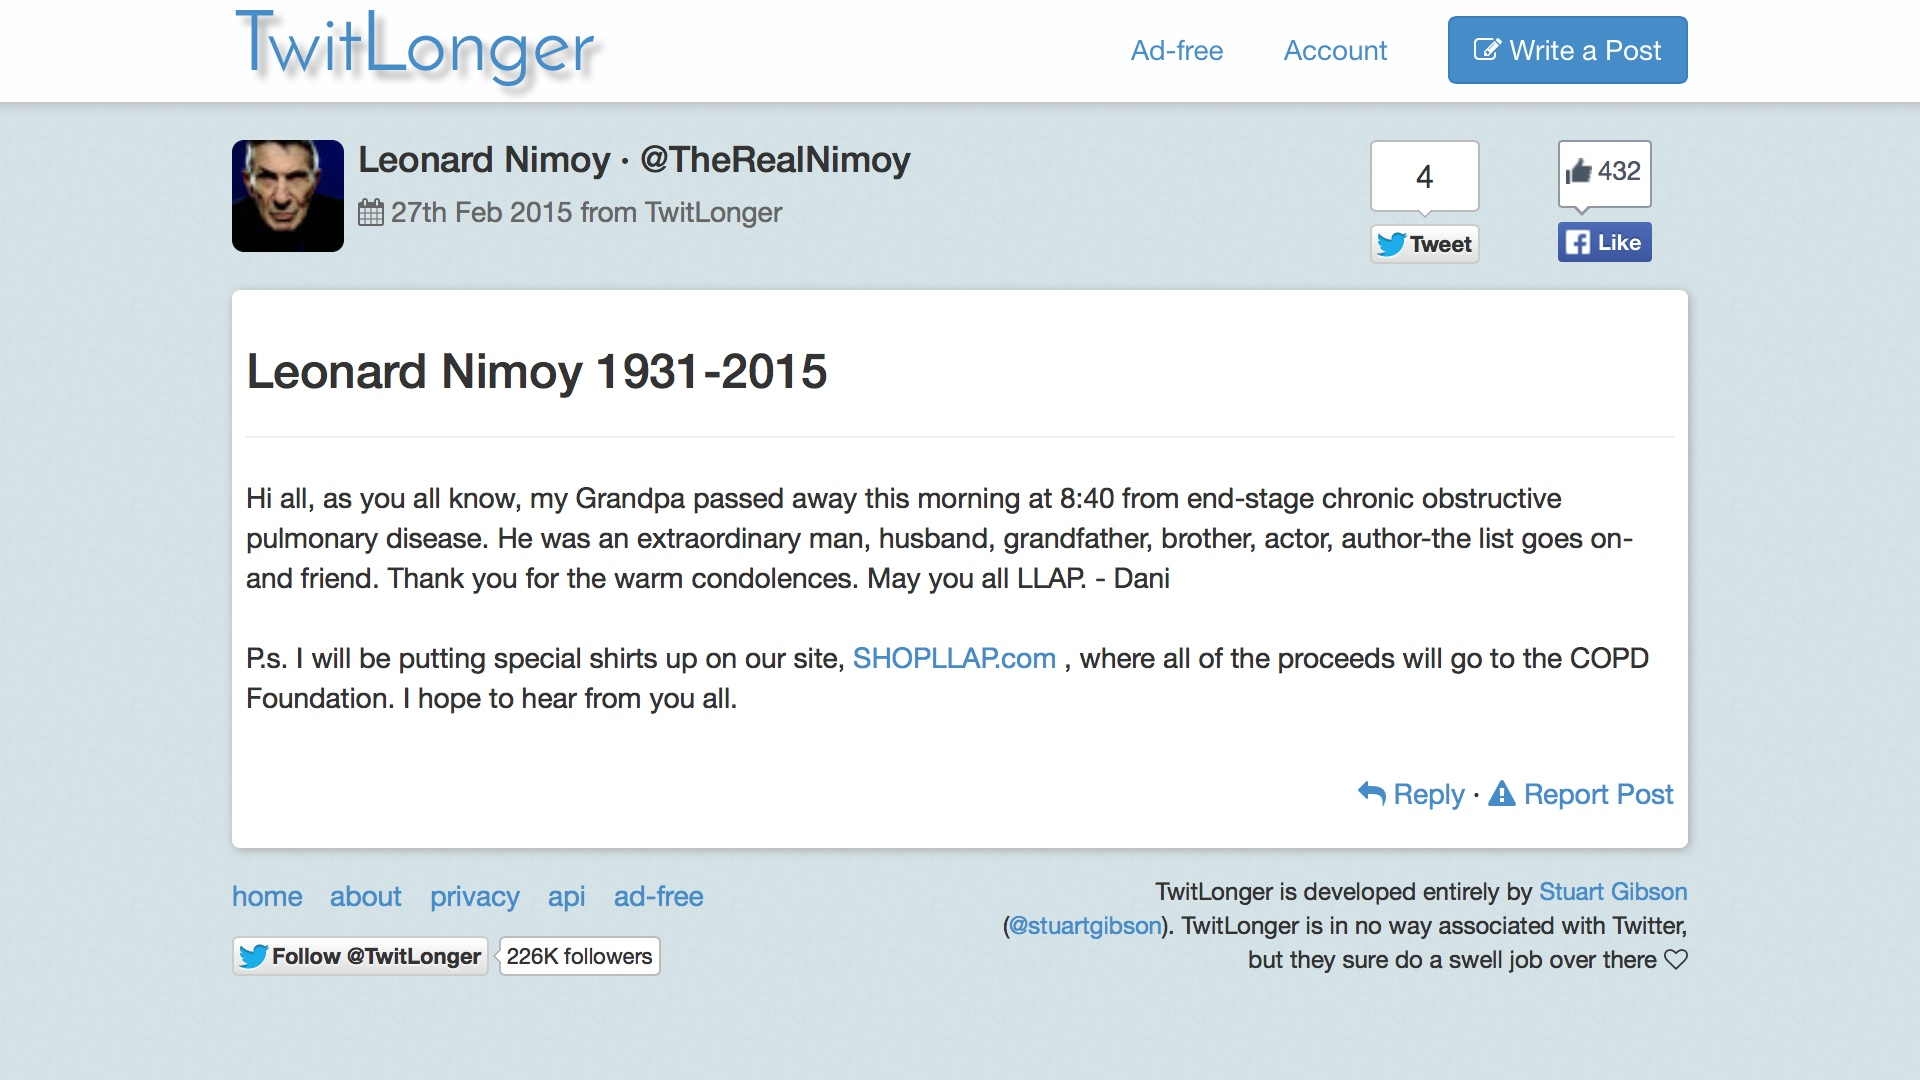 Leonard Nimoy 1931-2015 TwitLonger